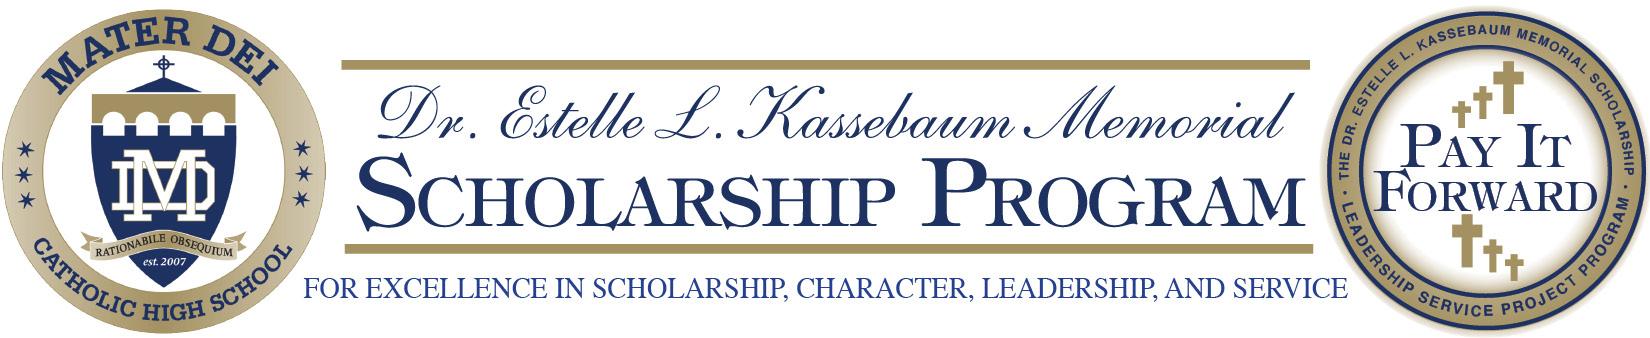 adasitetitle – DrKassebaumScholarship2